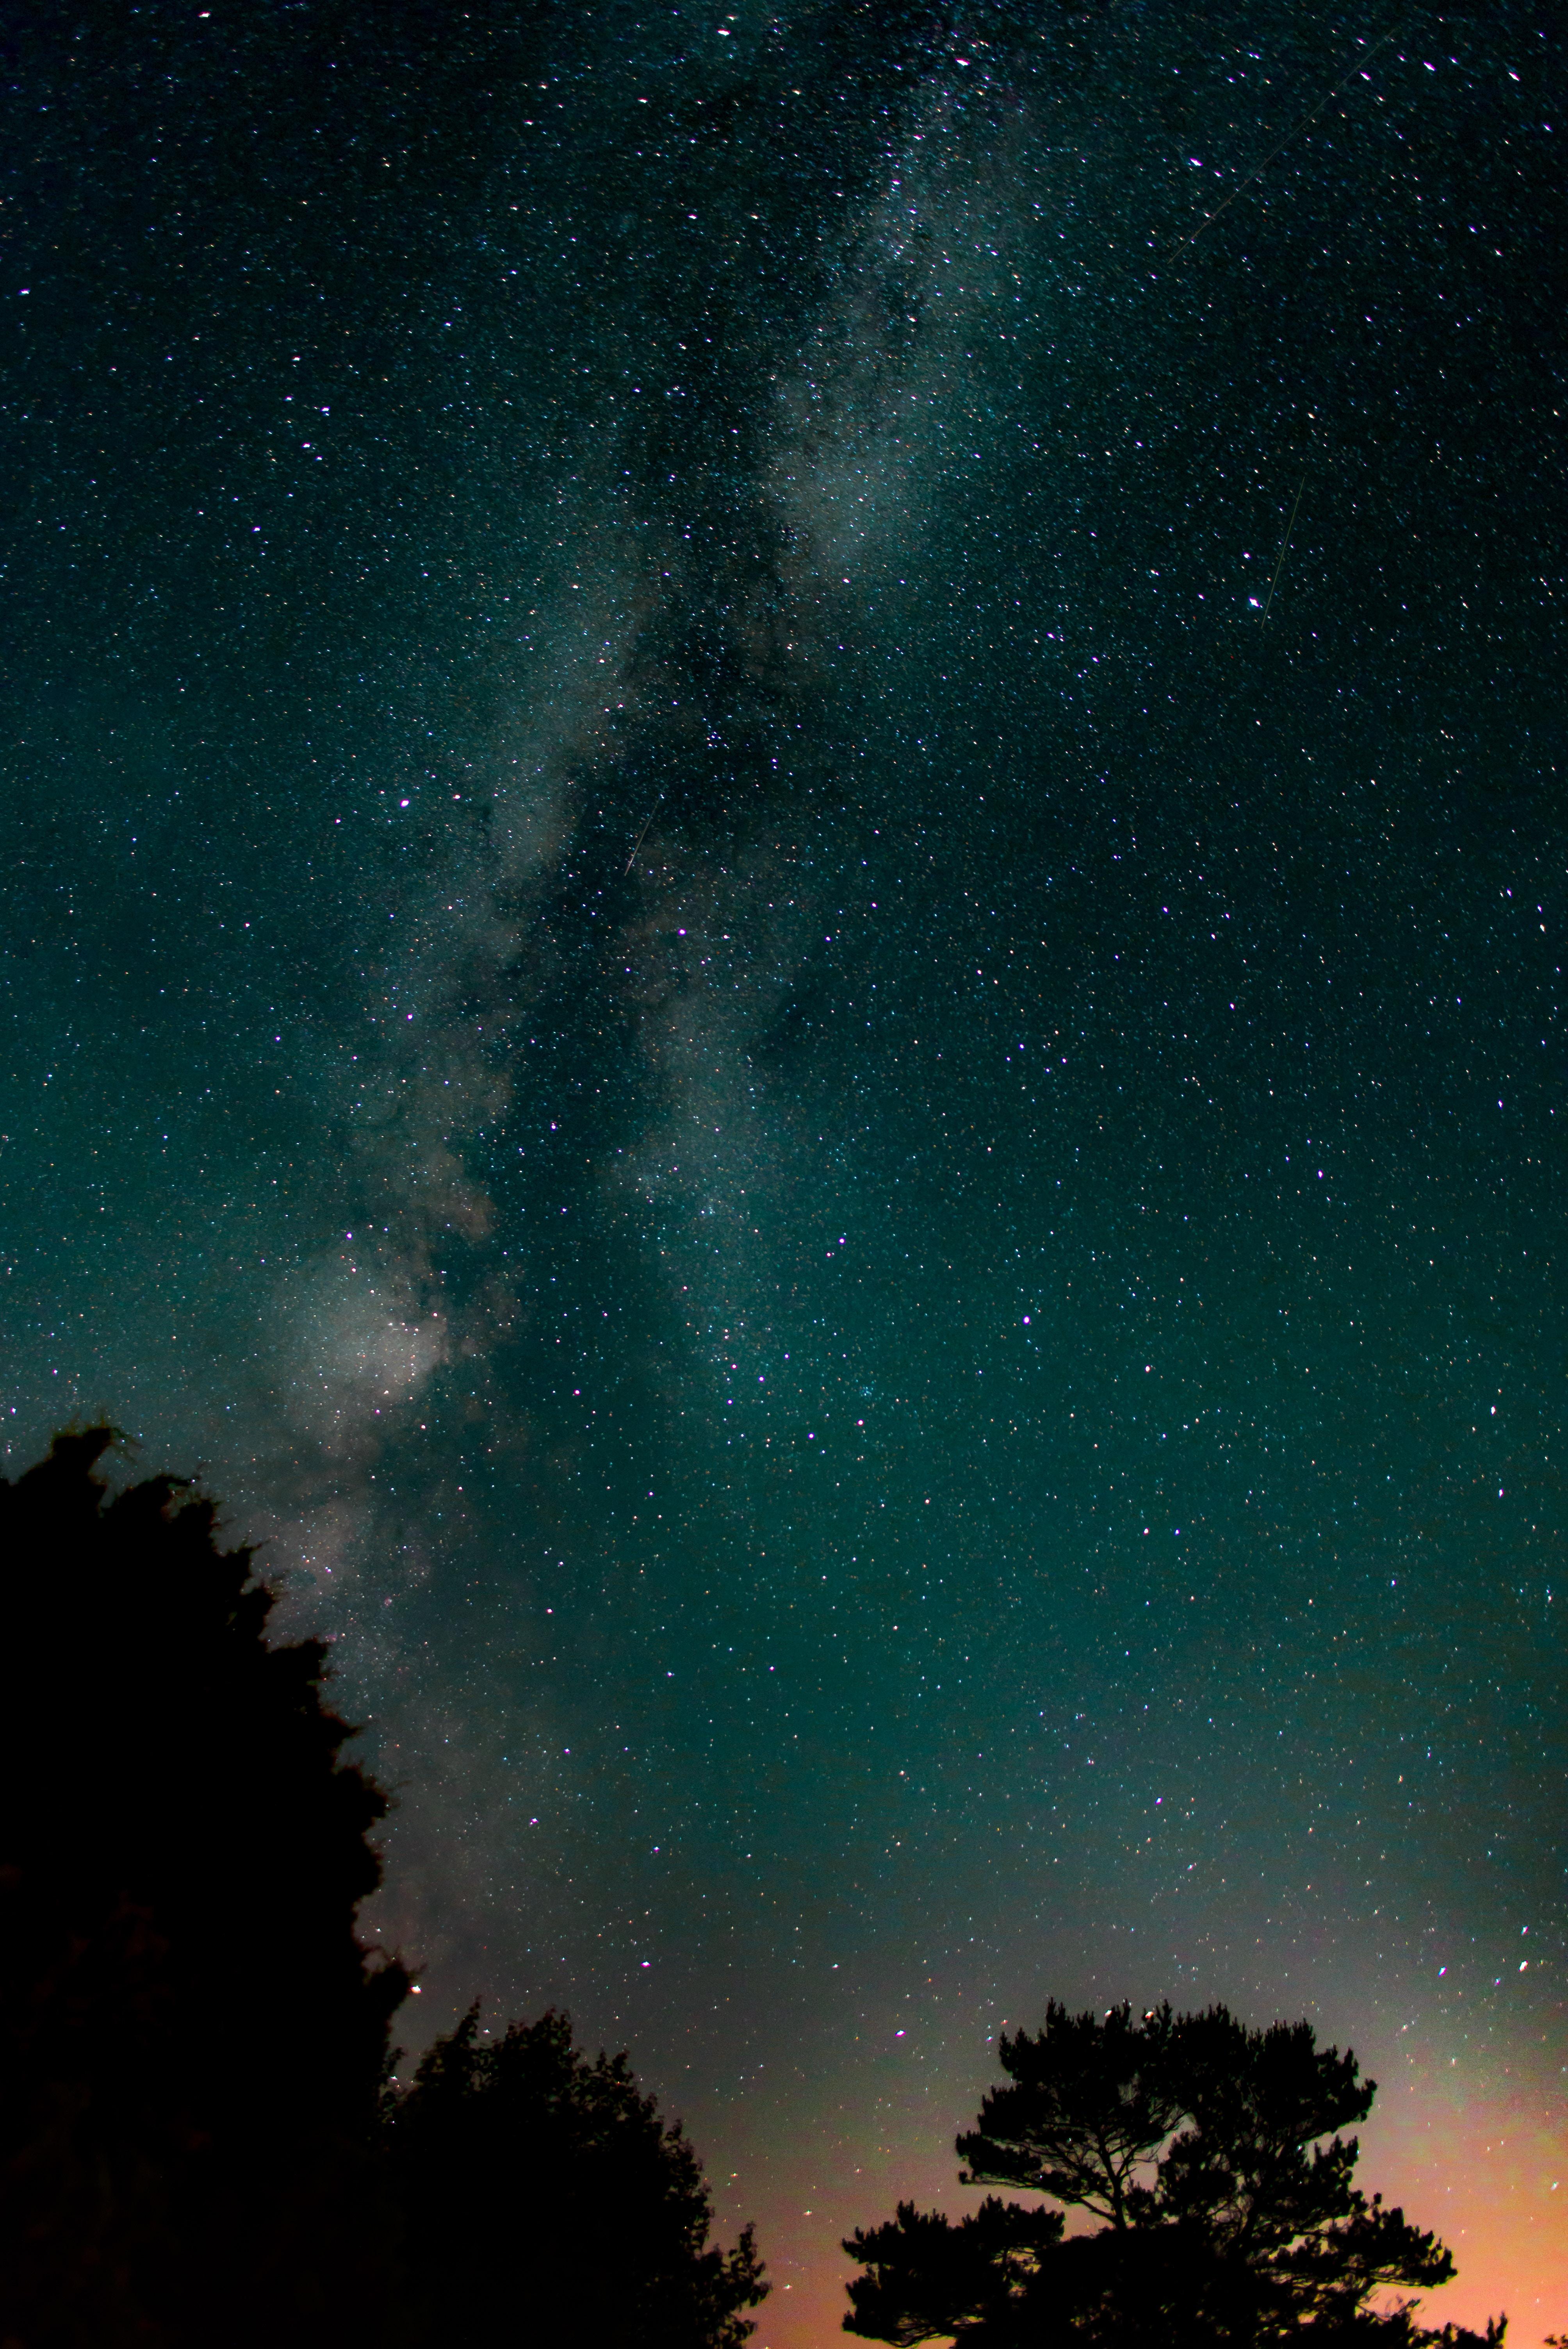 Gambar Pohon Langit Bintang Bima Sakti Suasana Ruang Kegelapan Galaksi Fajar Nebula Luar Angkasa Ilmu Alam Semesta Tengah Malam Objek Astronomi Fenomena Meteorologi Atmosfer Bumi Komputer Wallpaper 4016x6016 1411918 Galeri Foto